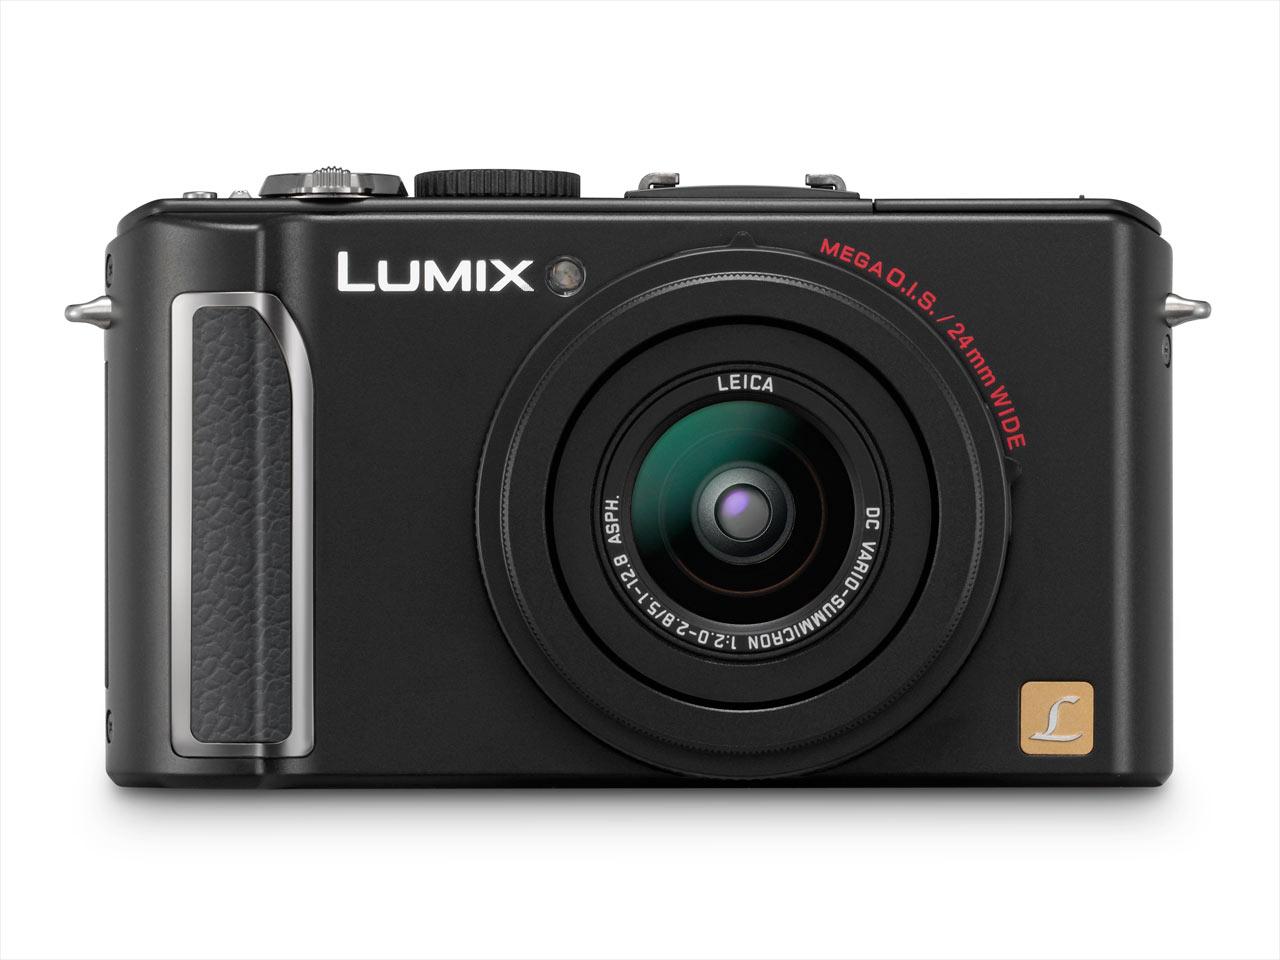 panasonic lumix dmc lx3 digital photography review rh dpreview com Panasonic LX5 Panasonic Lumix DMC-FZ50